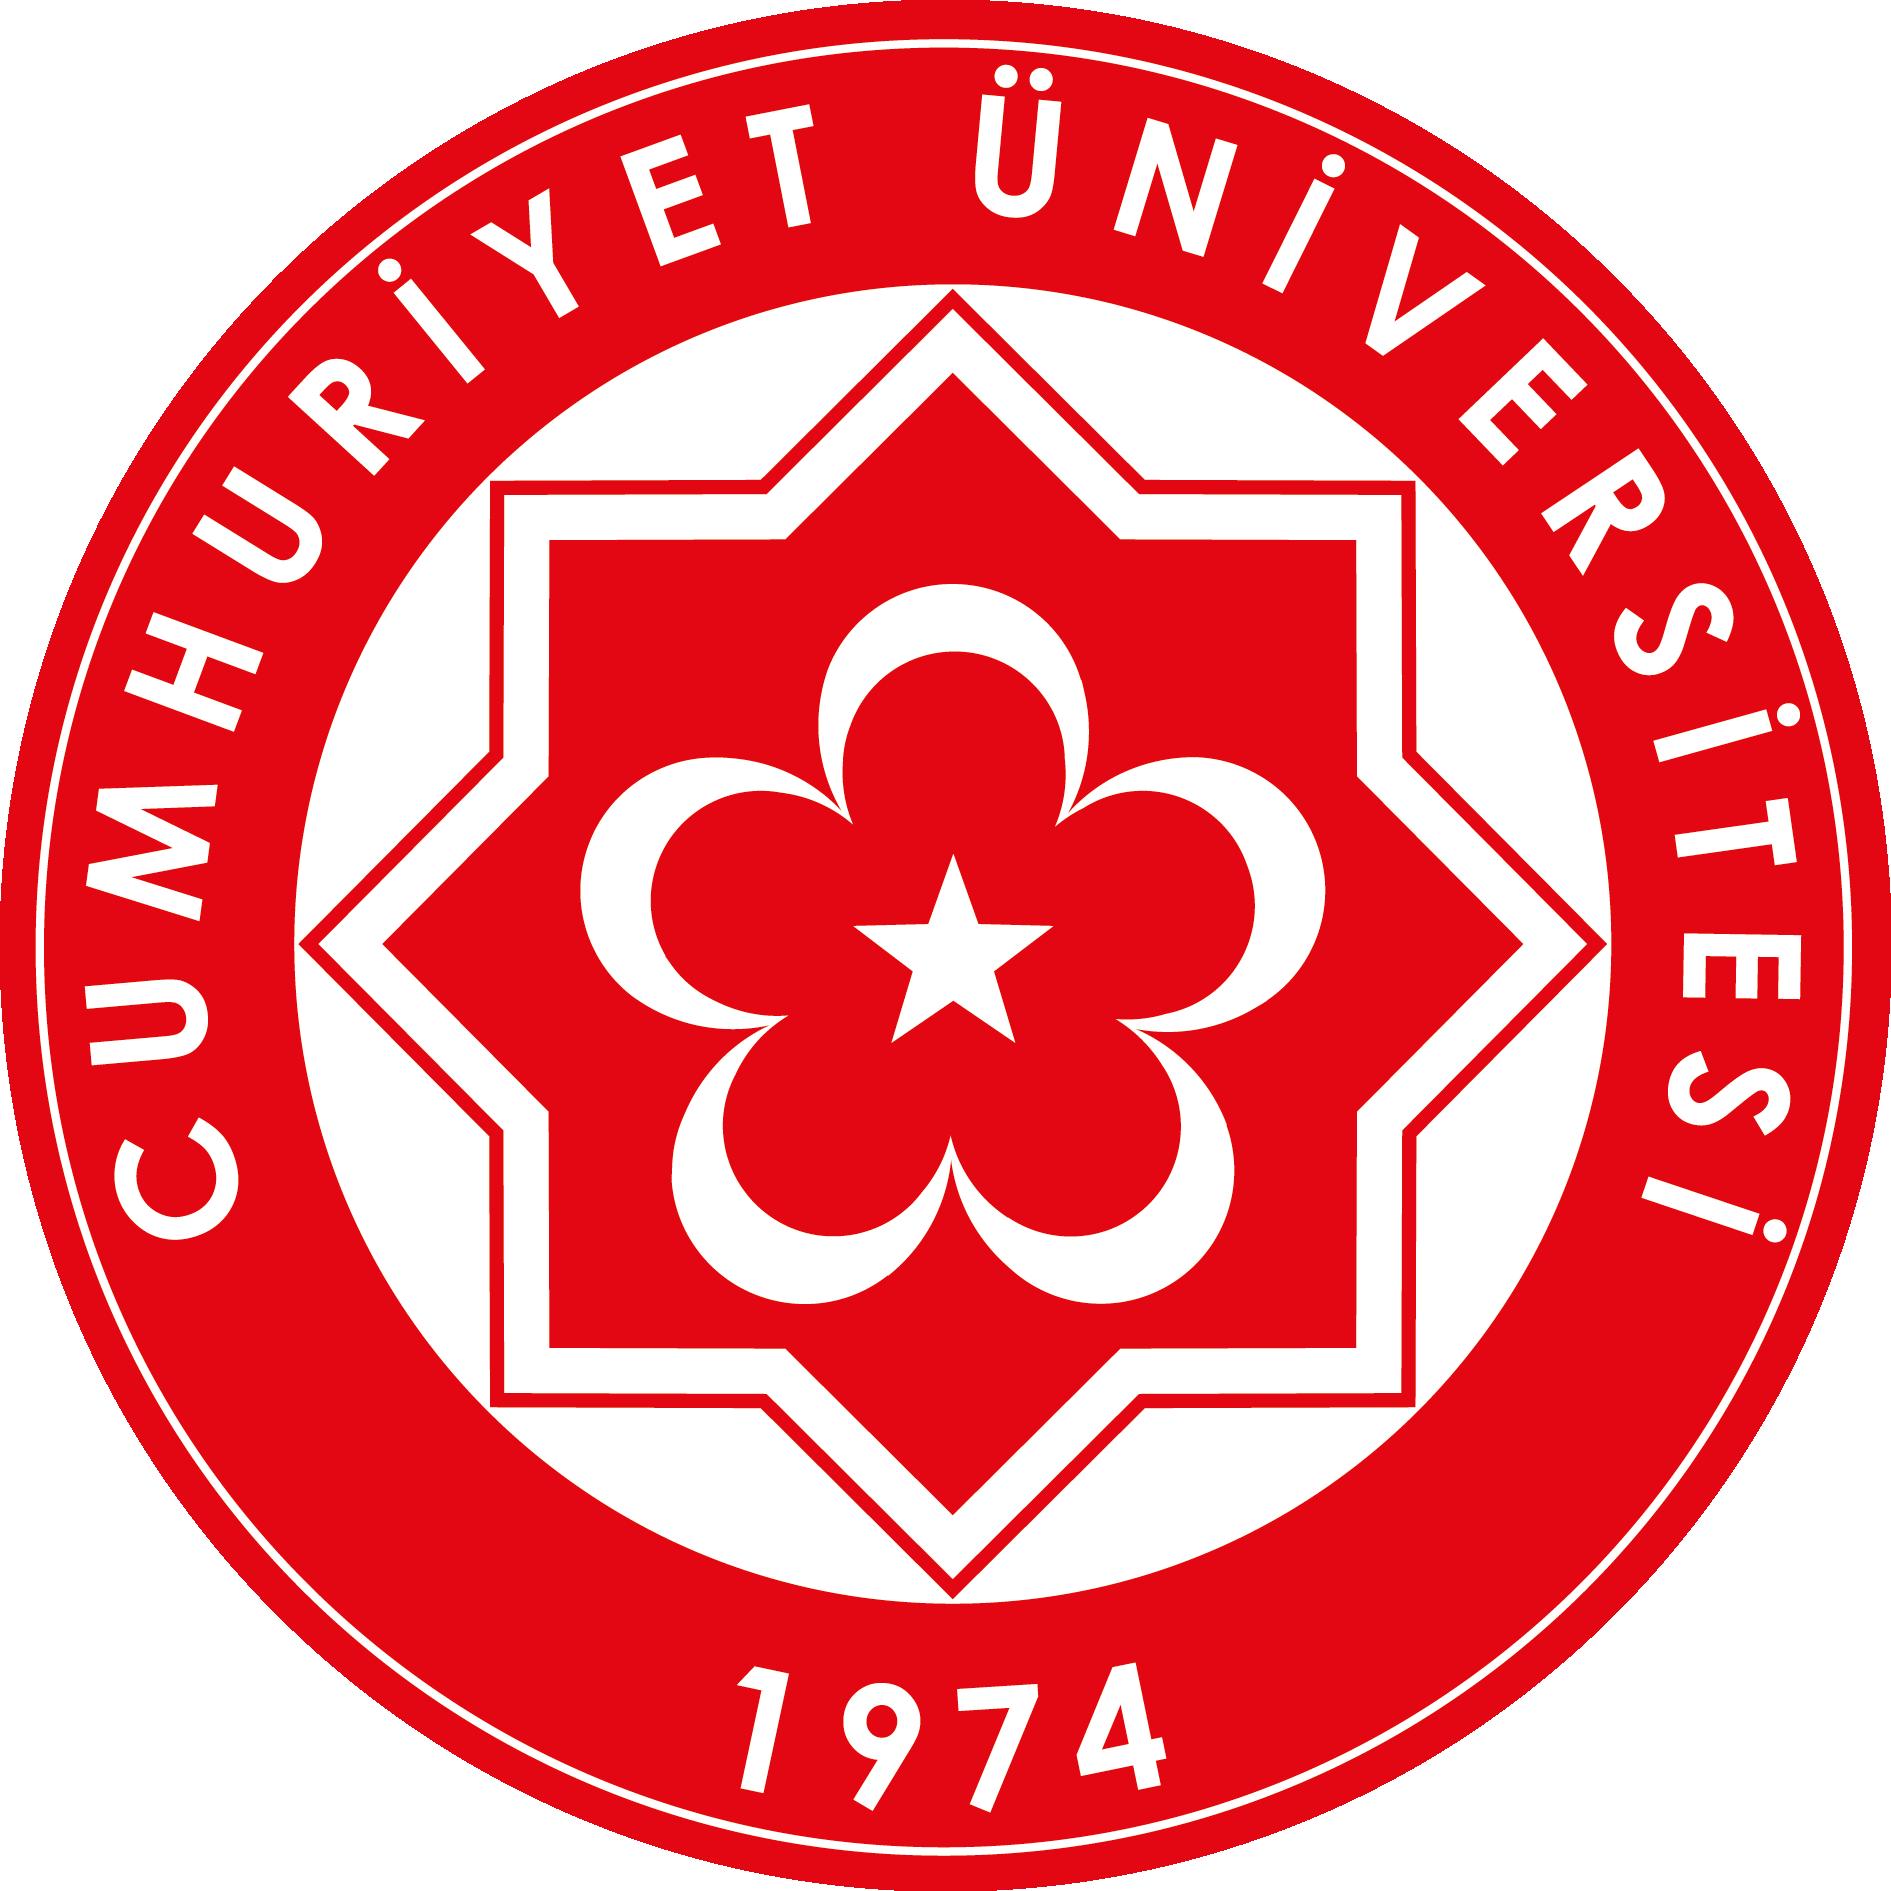 Sivas Cumhuriyet Üniversitesi rhr